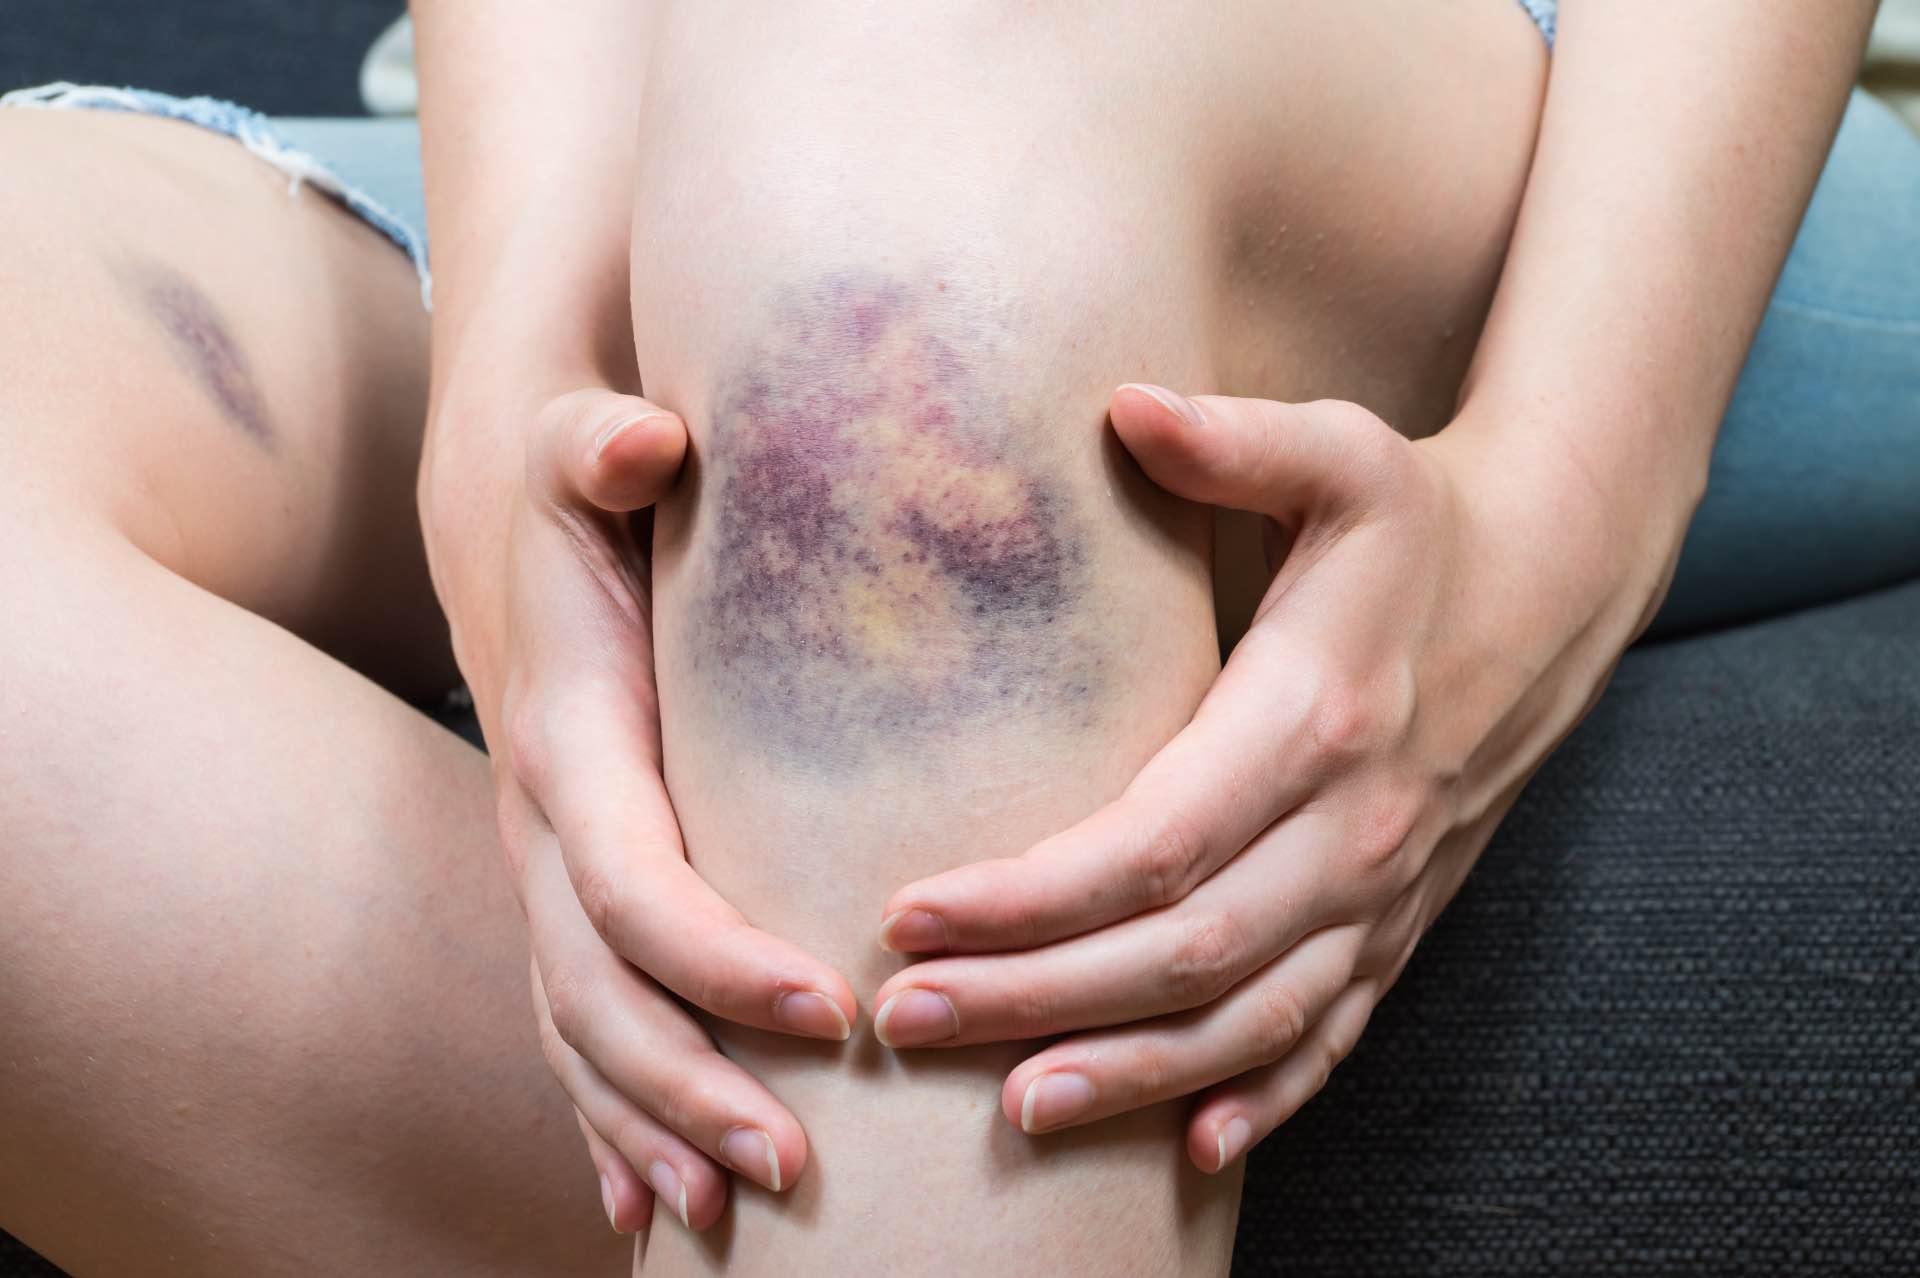 Domestic Abuse legal help in Devon